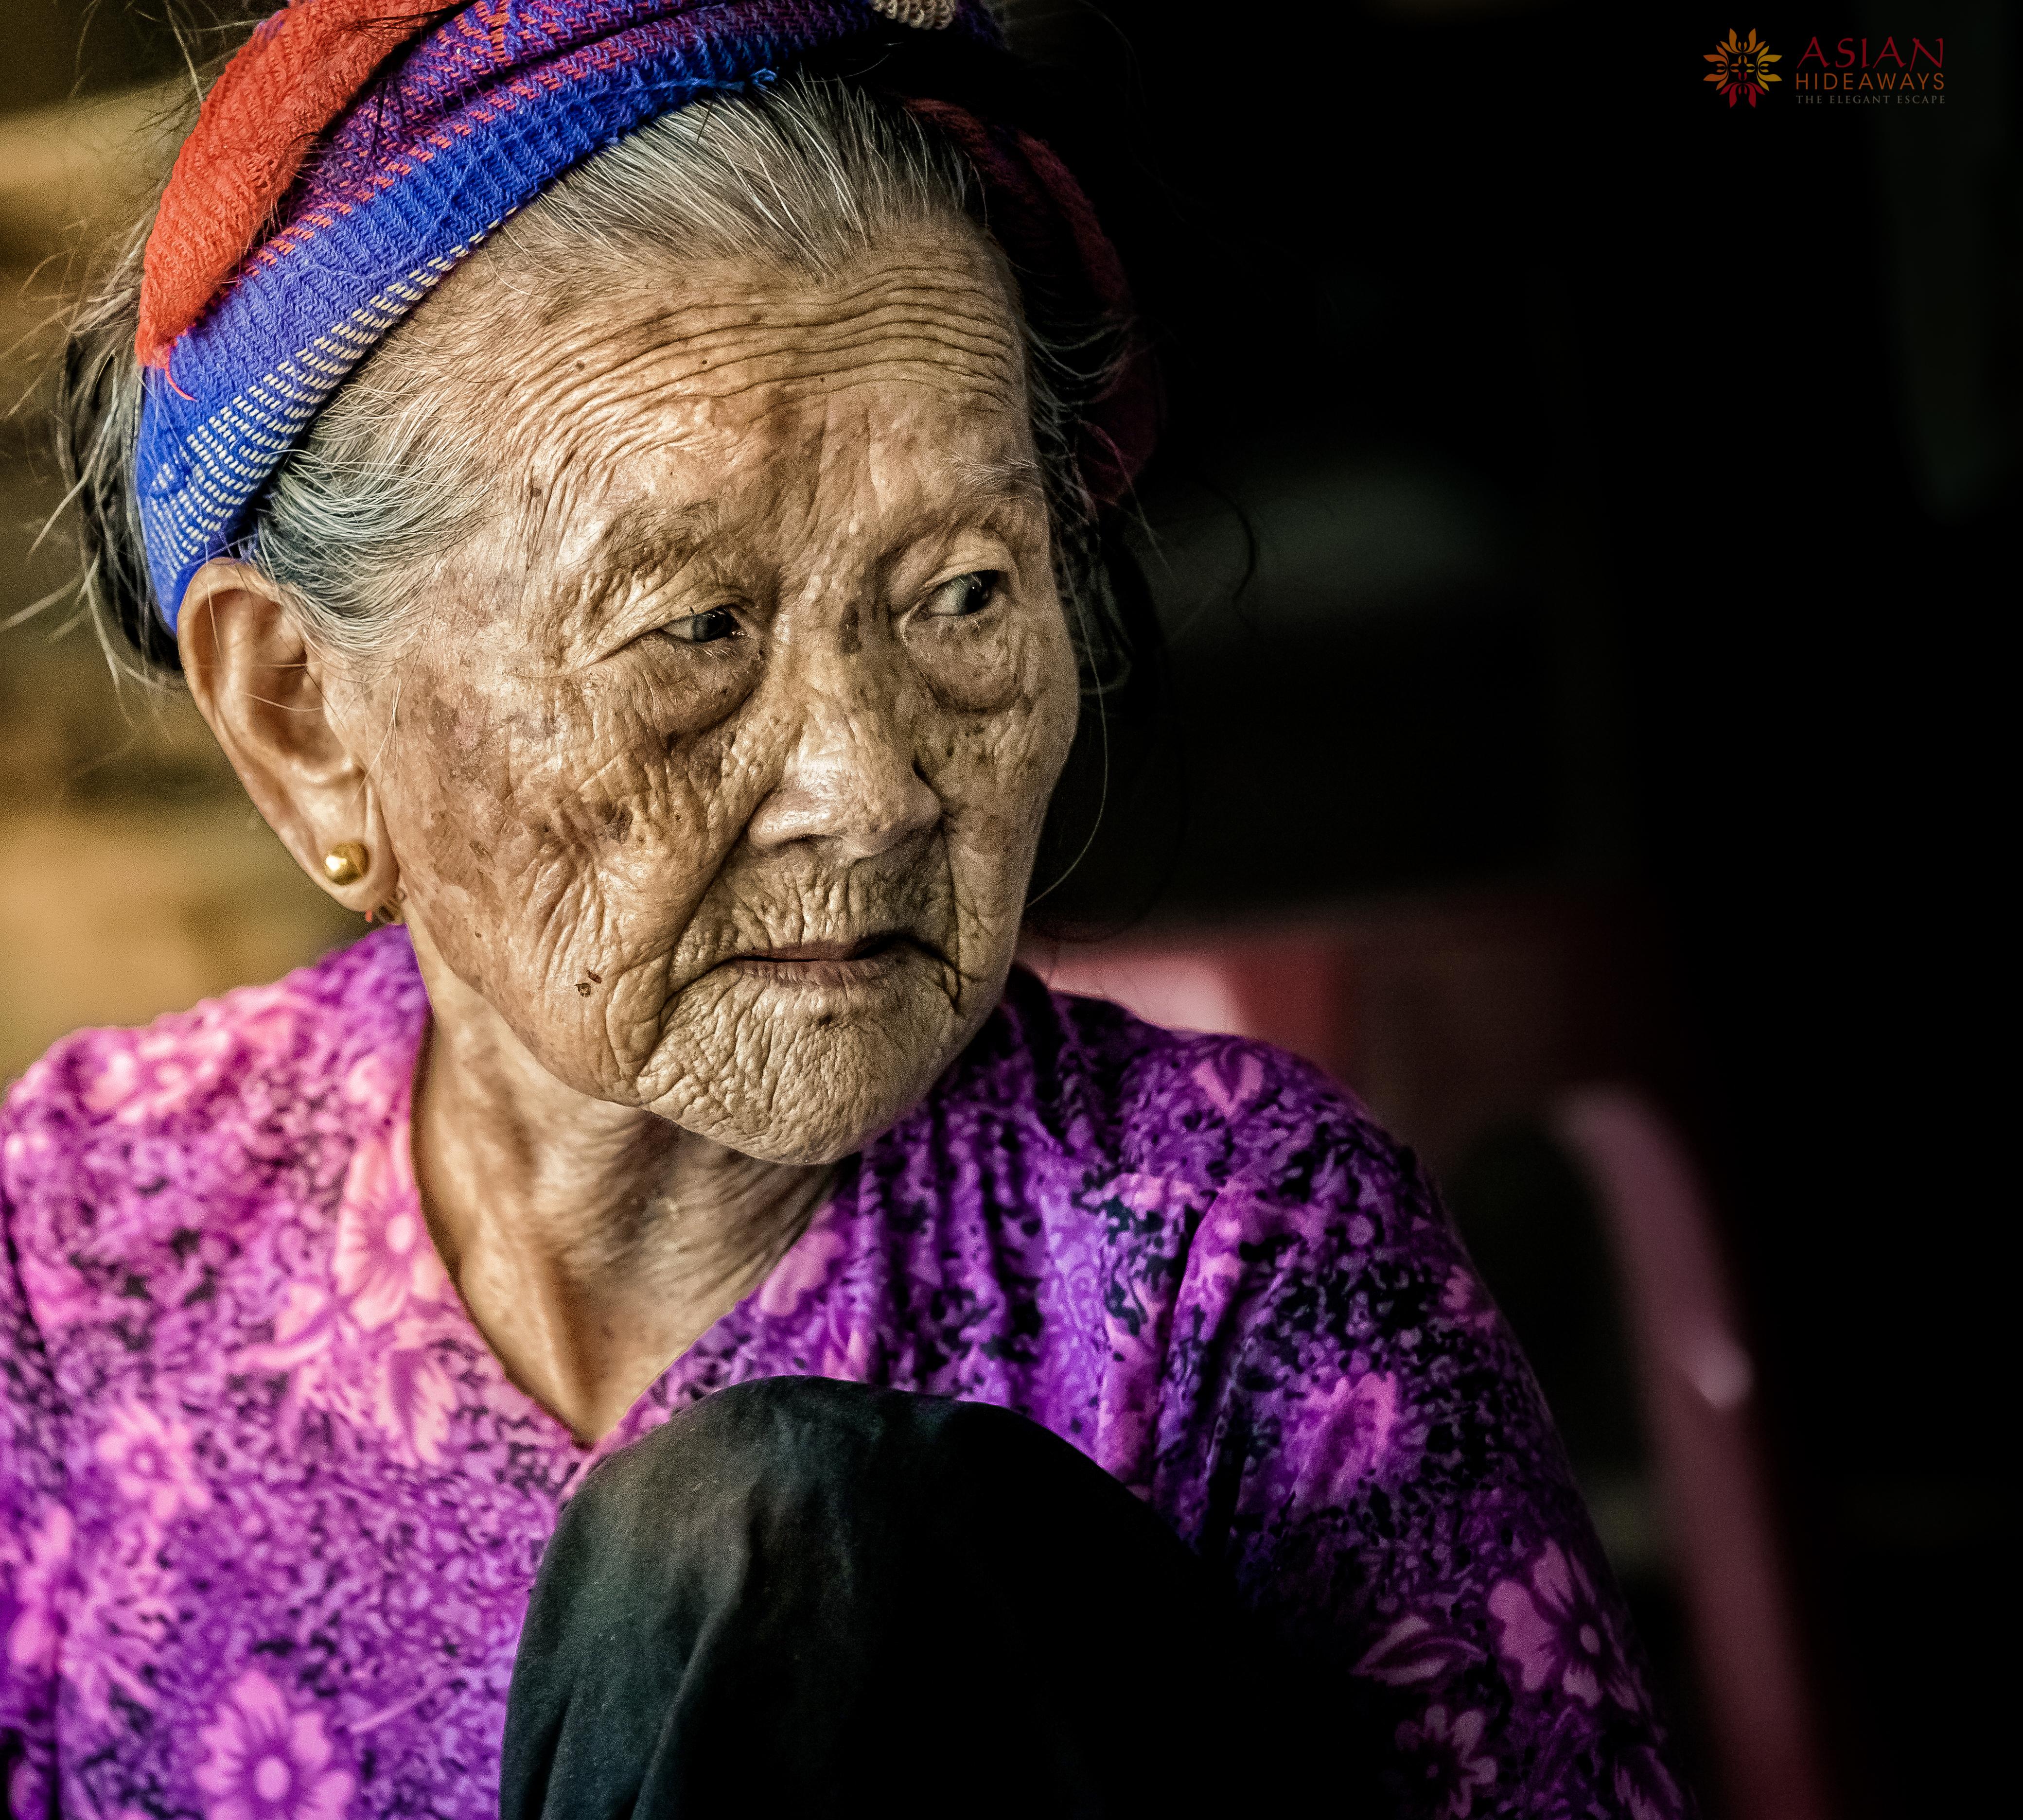 asiatisk bedstemor